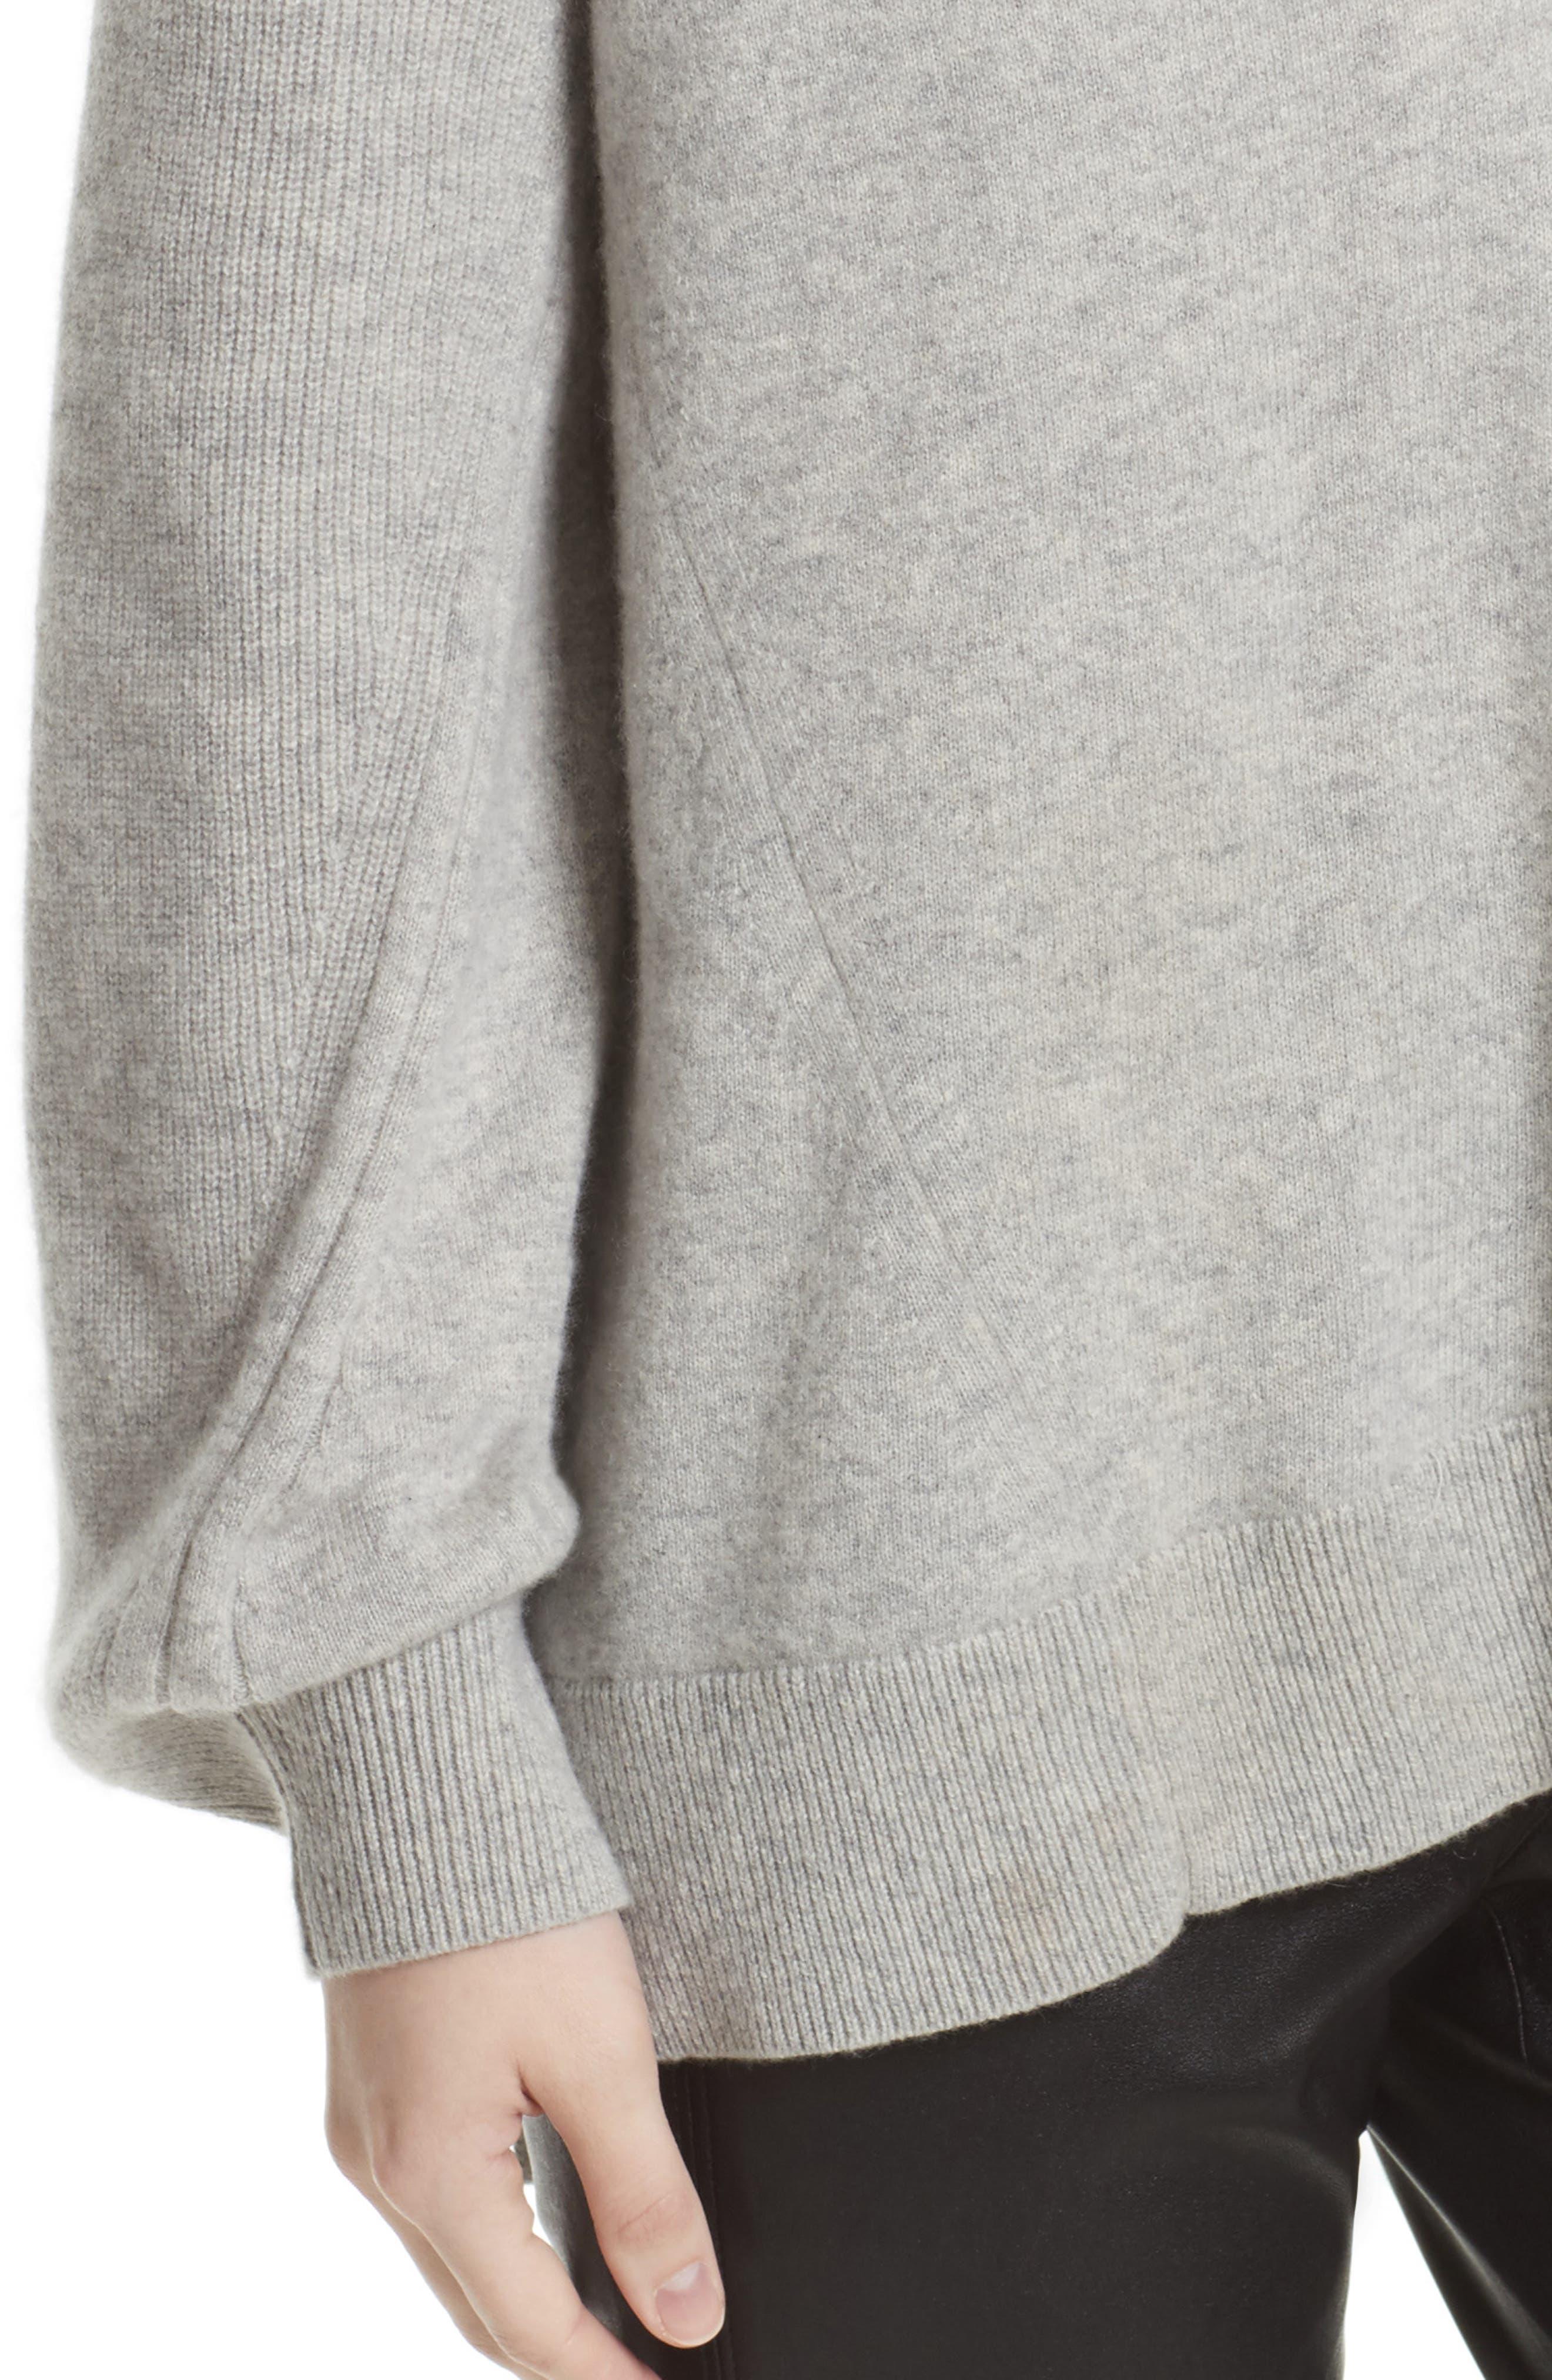 Ace Cashmere Sweater,                             Alternate thumbnail 4, color,                             058